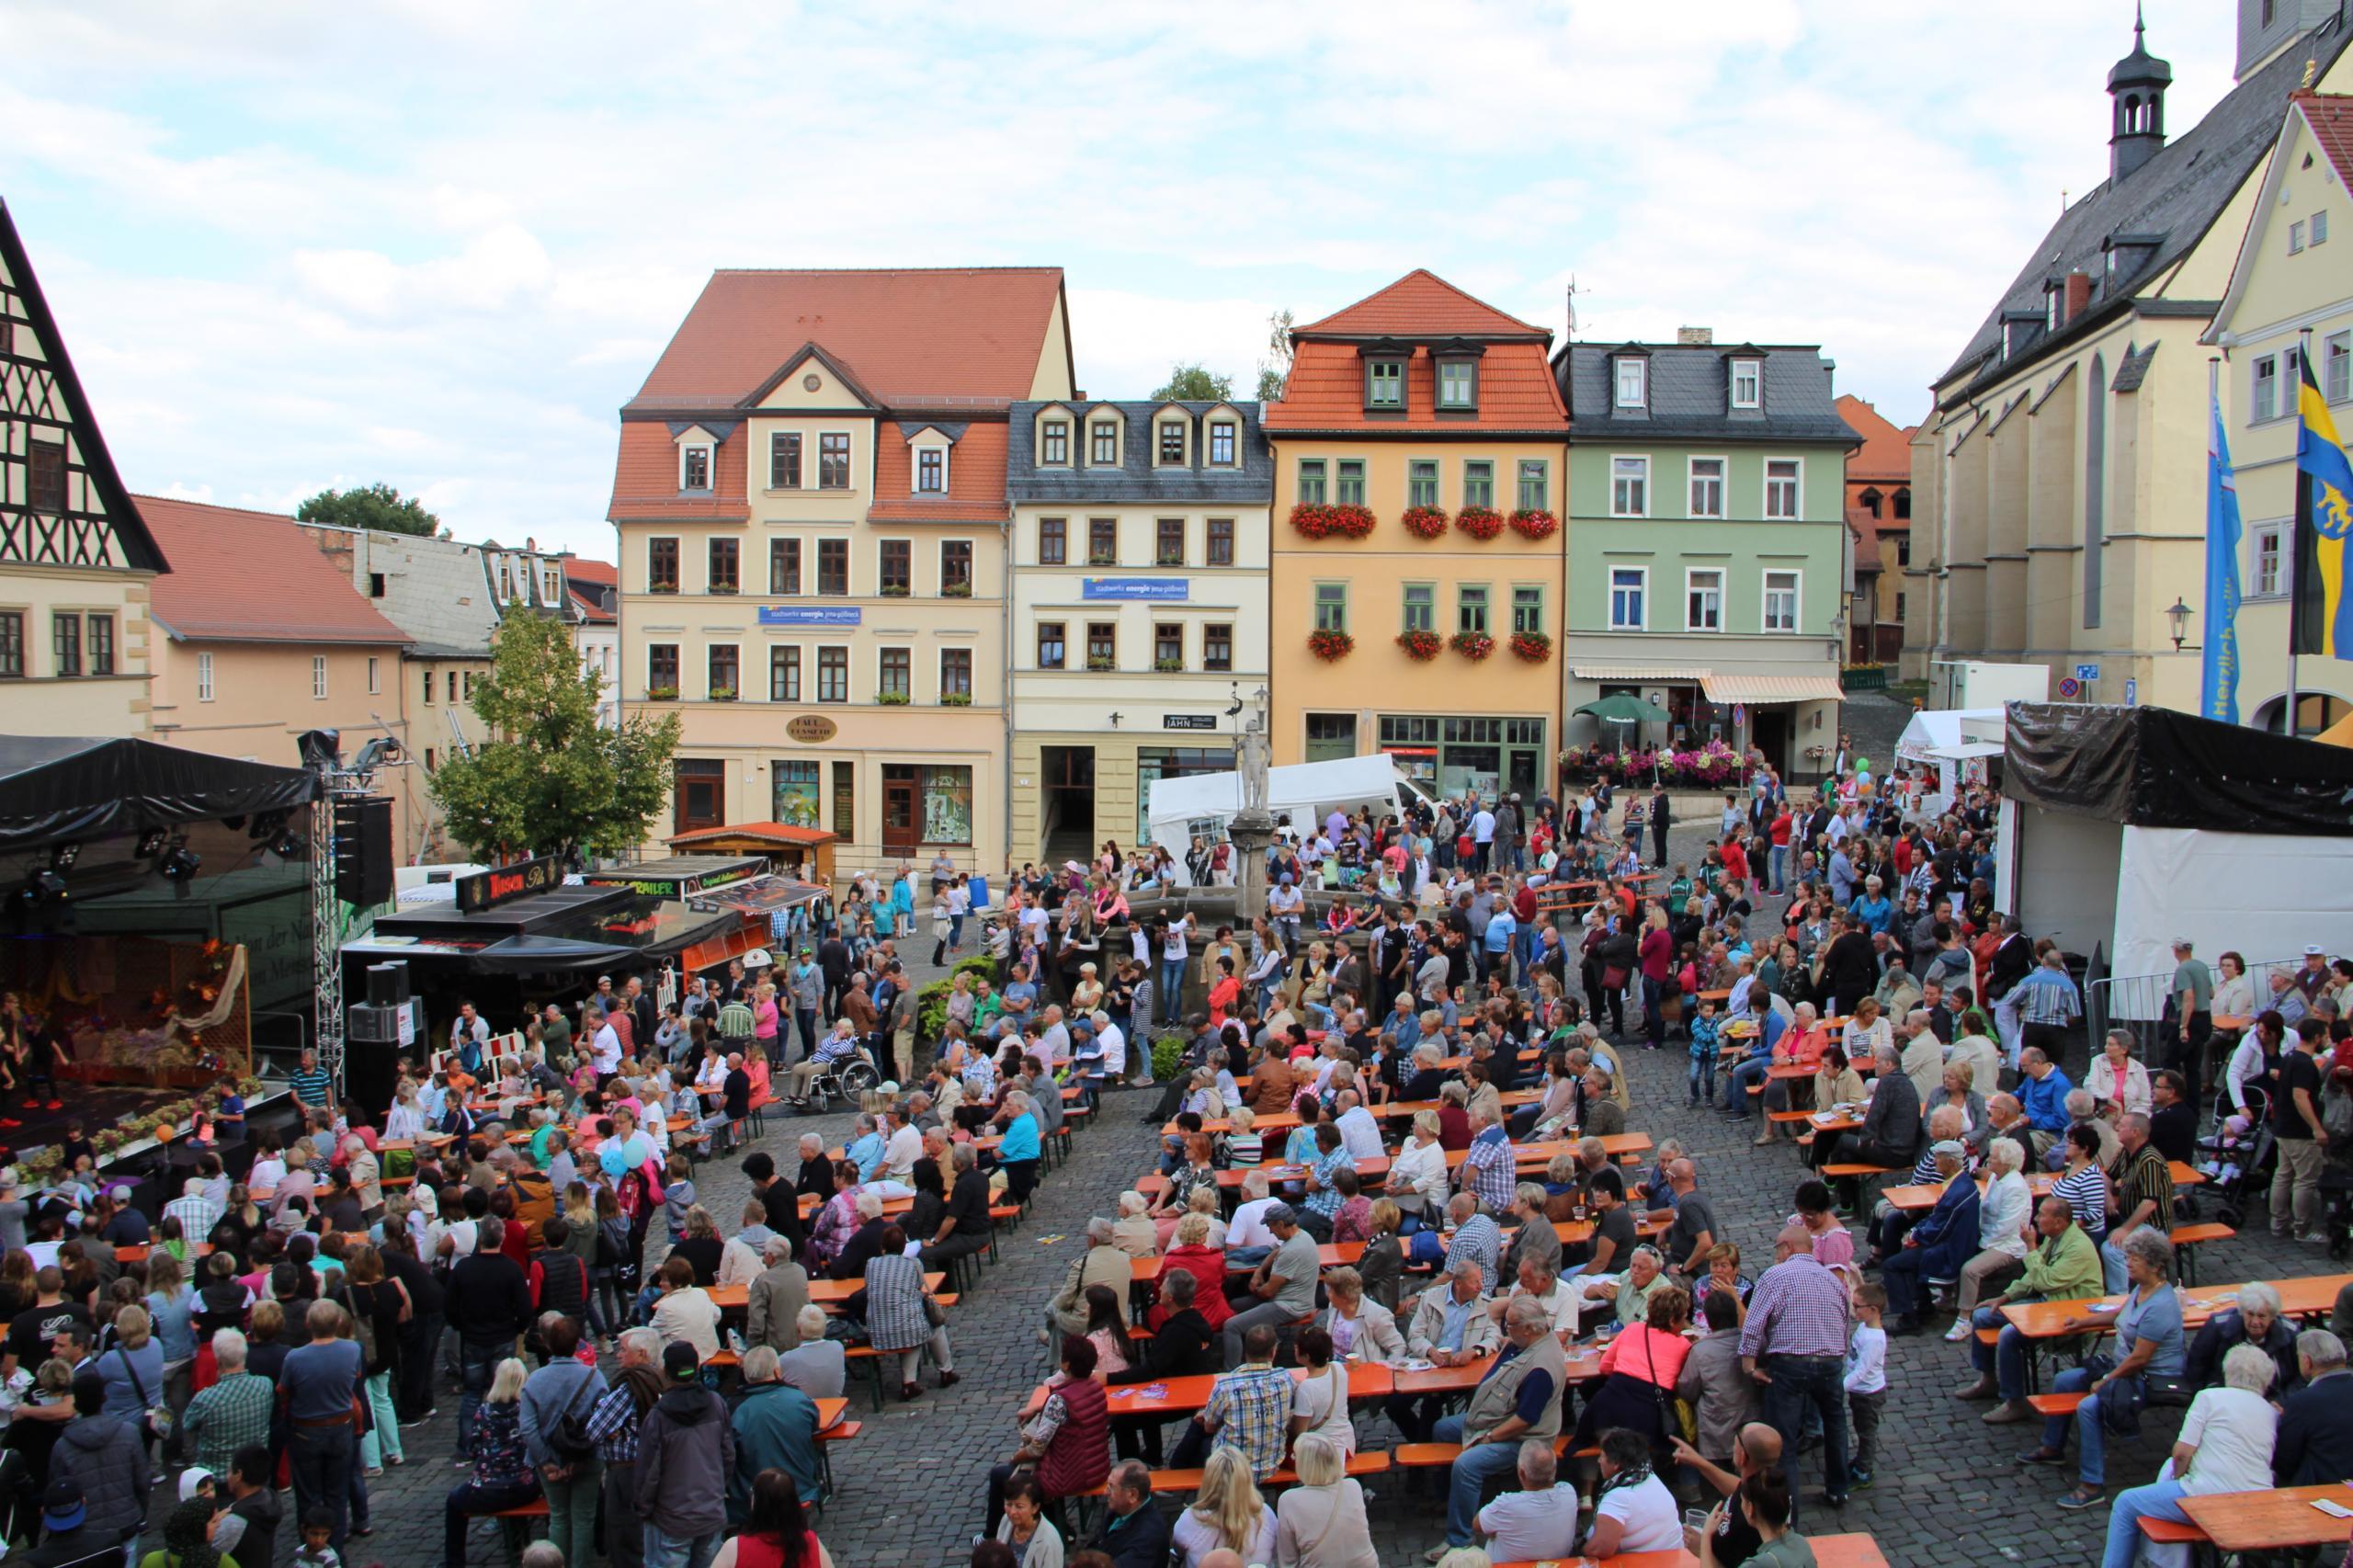 stadtfest pn 2017 fachbereich kultur img 2144 ©Stadt Pößneck